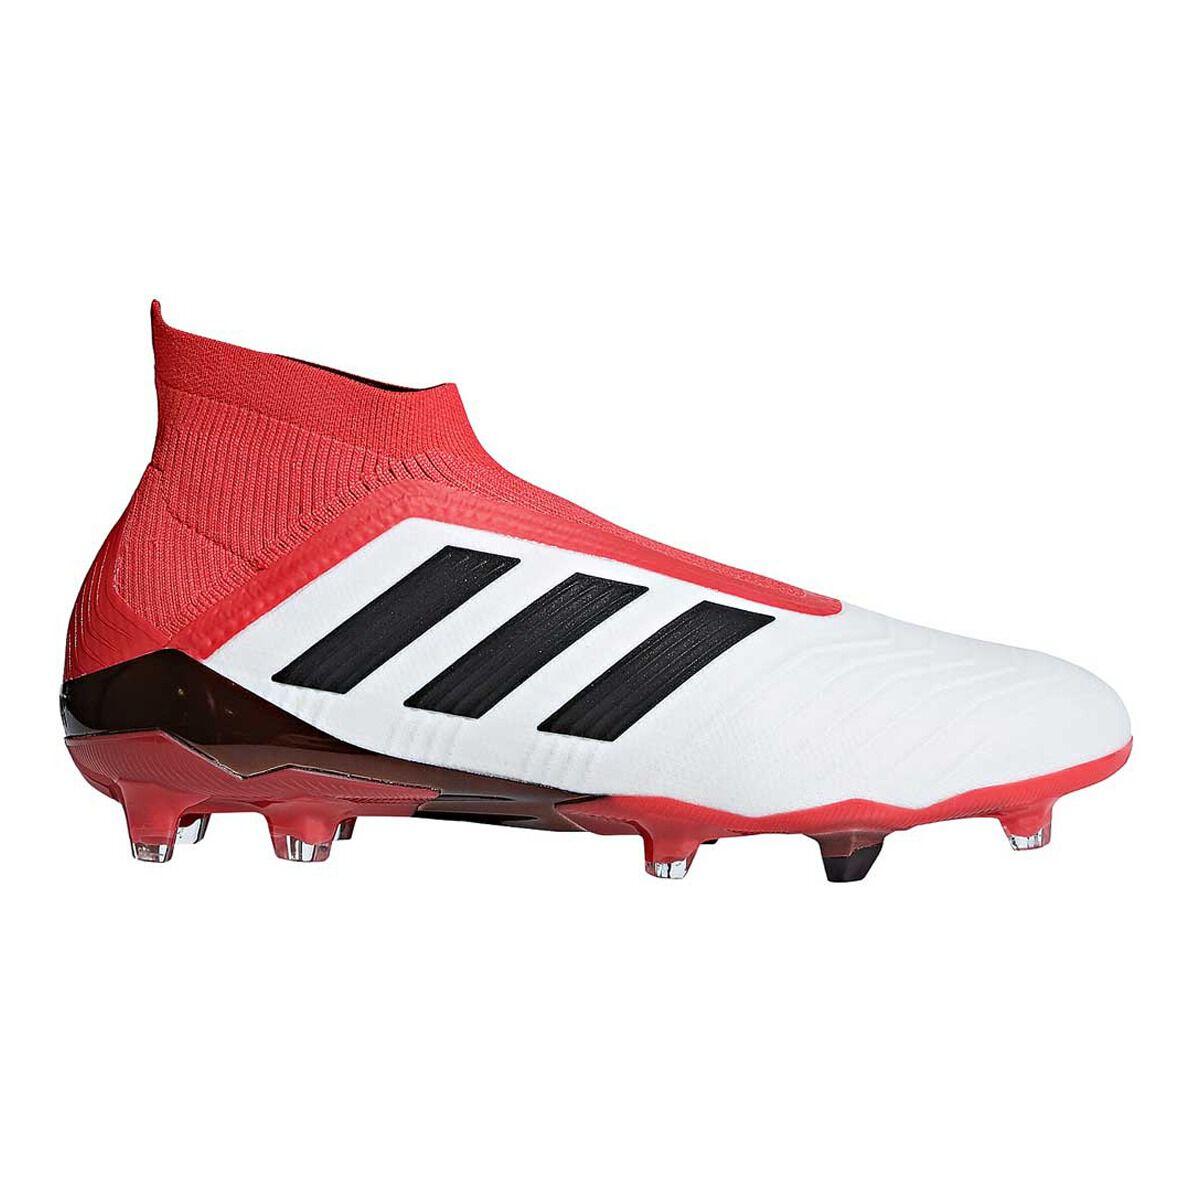 separation shoes 2c5b7 53bad ... low cost adidas predator 18 fg mens football boots white black us 9  adult white 9c66a